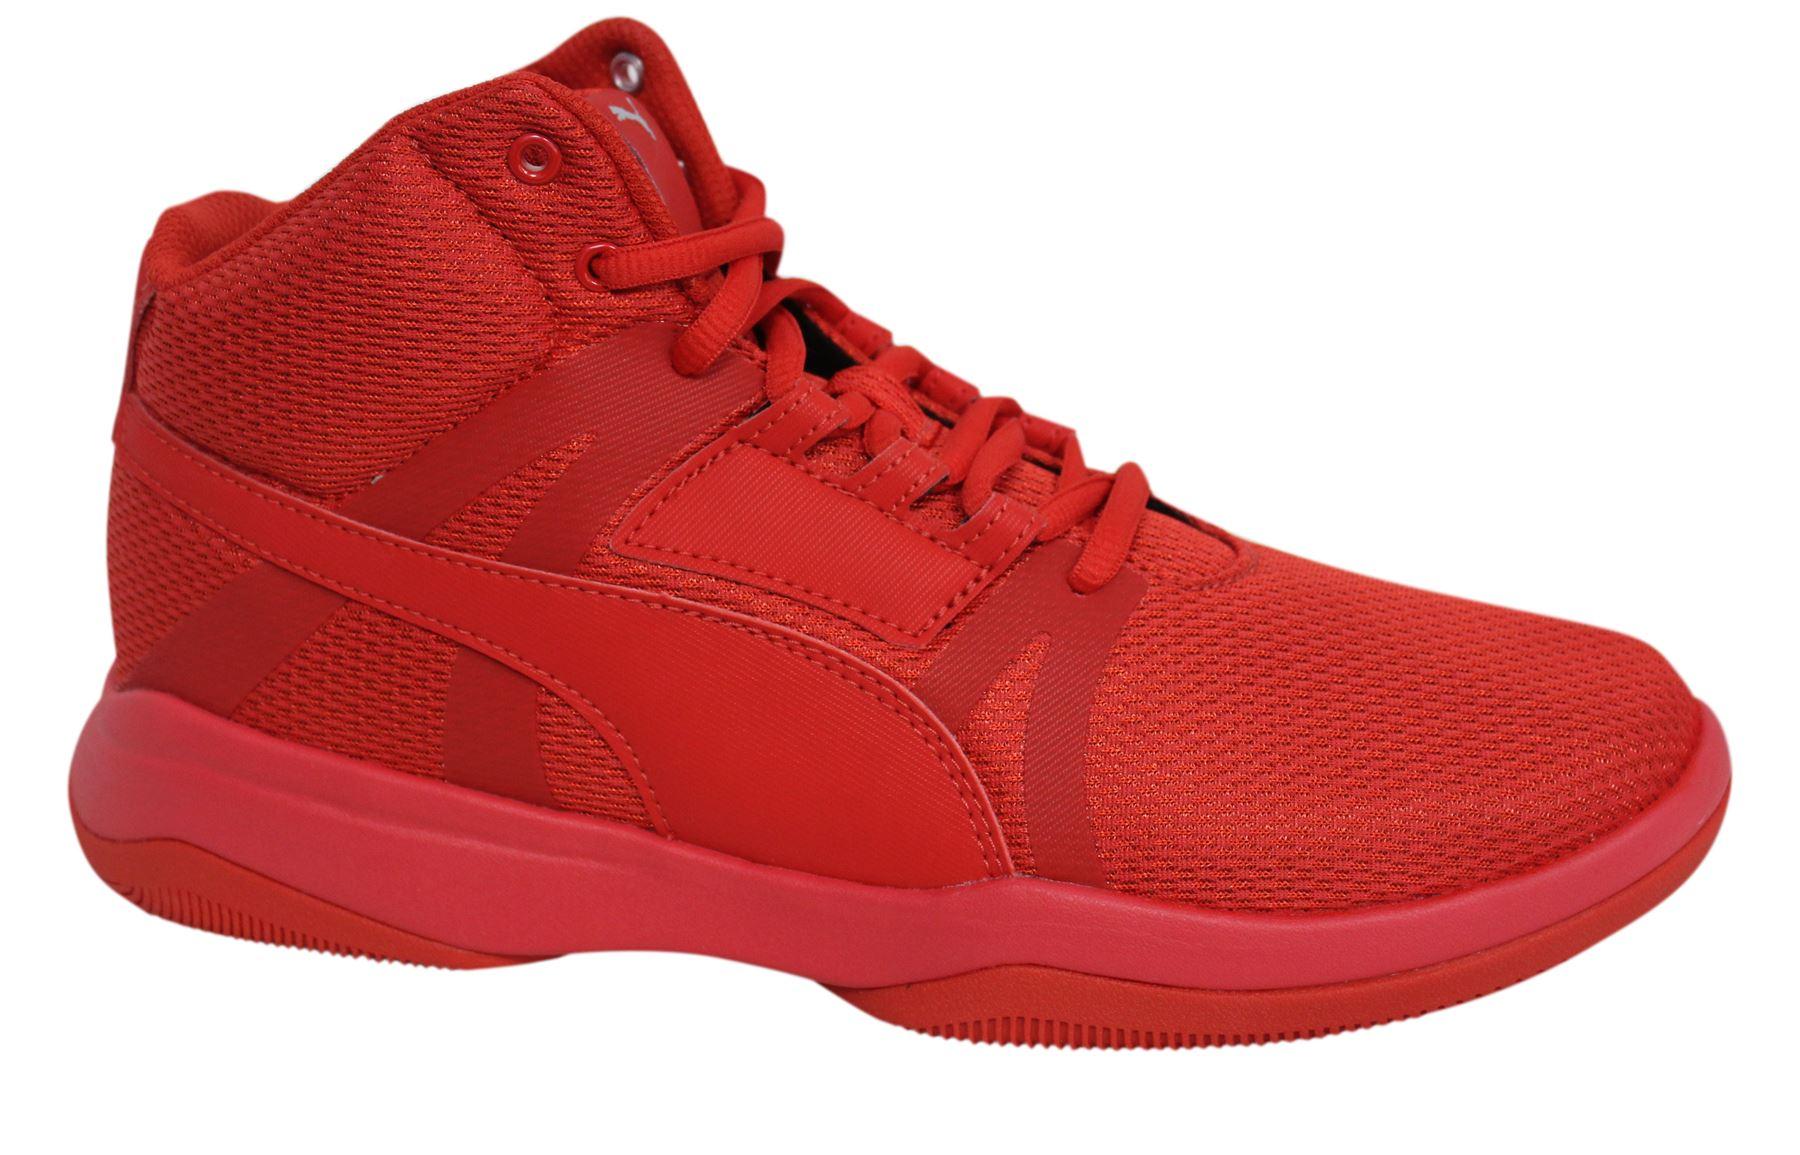 6d980ef78 Puma Evo rimbalzo Street stringate rosso tessile Mens Mid scarpe da  ginnastica alte 361171 07 M14